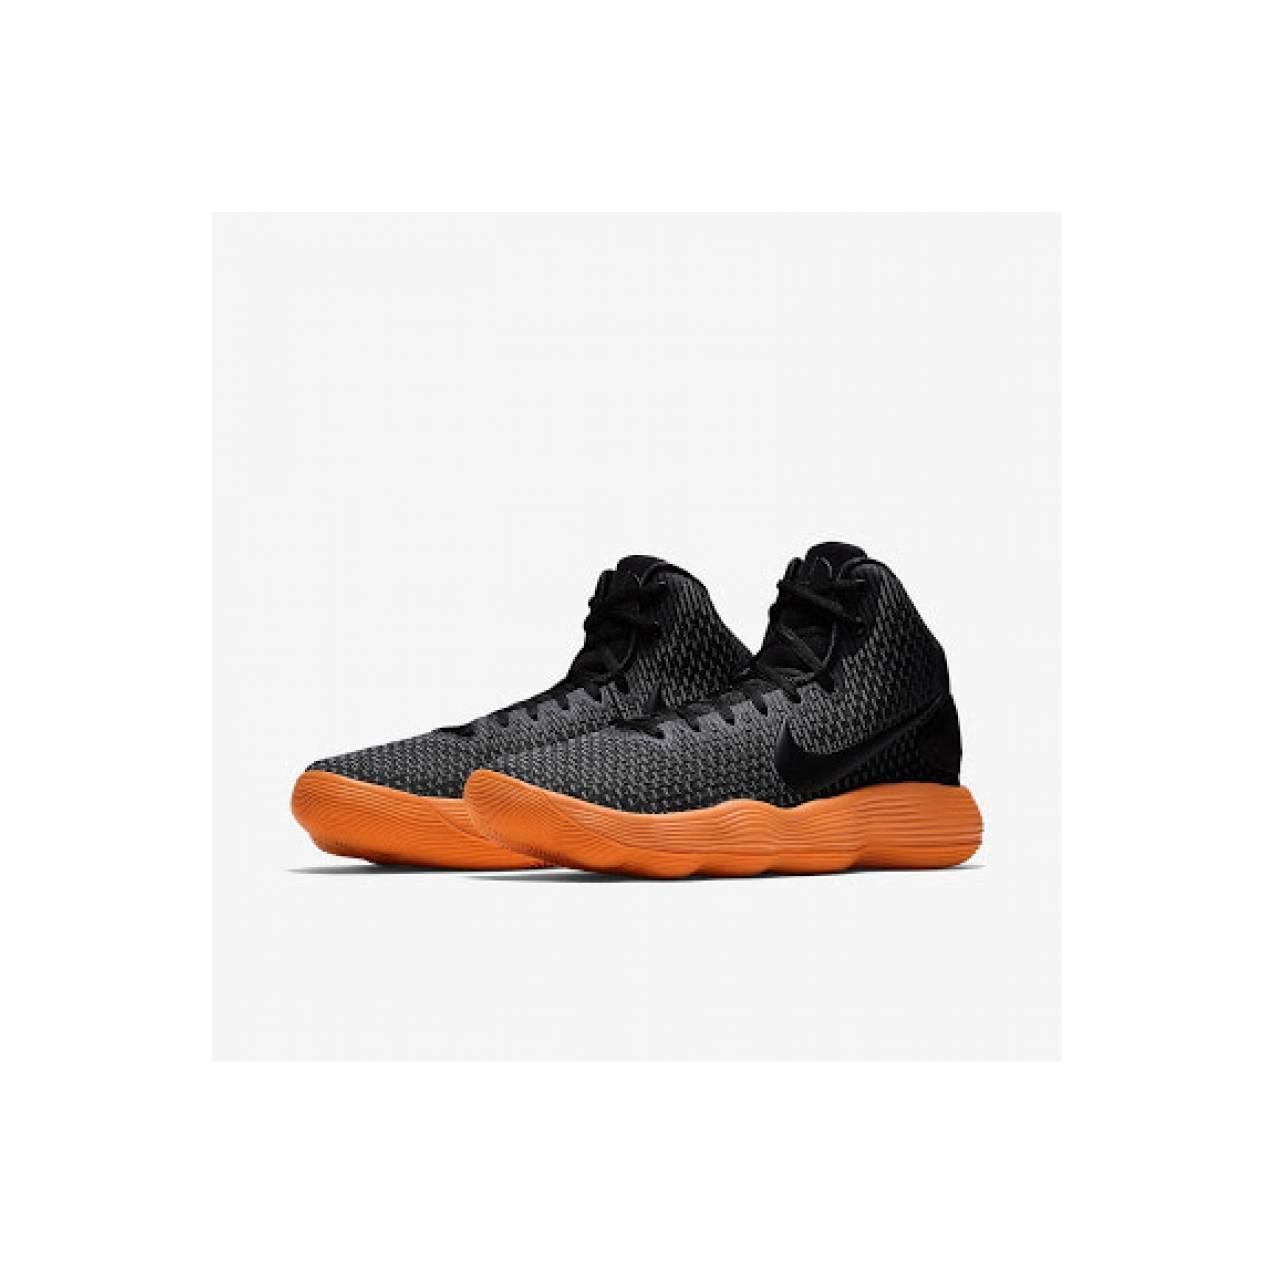 Sepatu Basket NIKE Hyperdunk 2017 897631 007 Murah Original